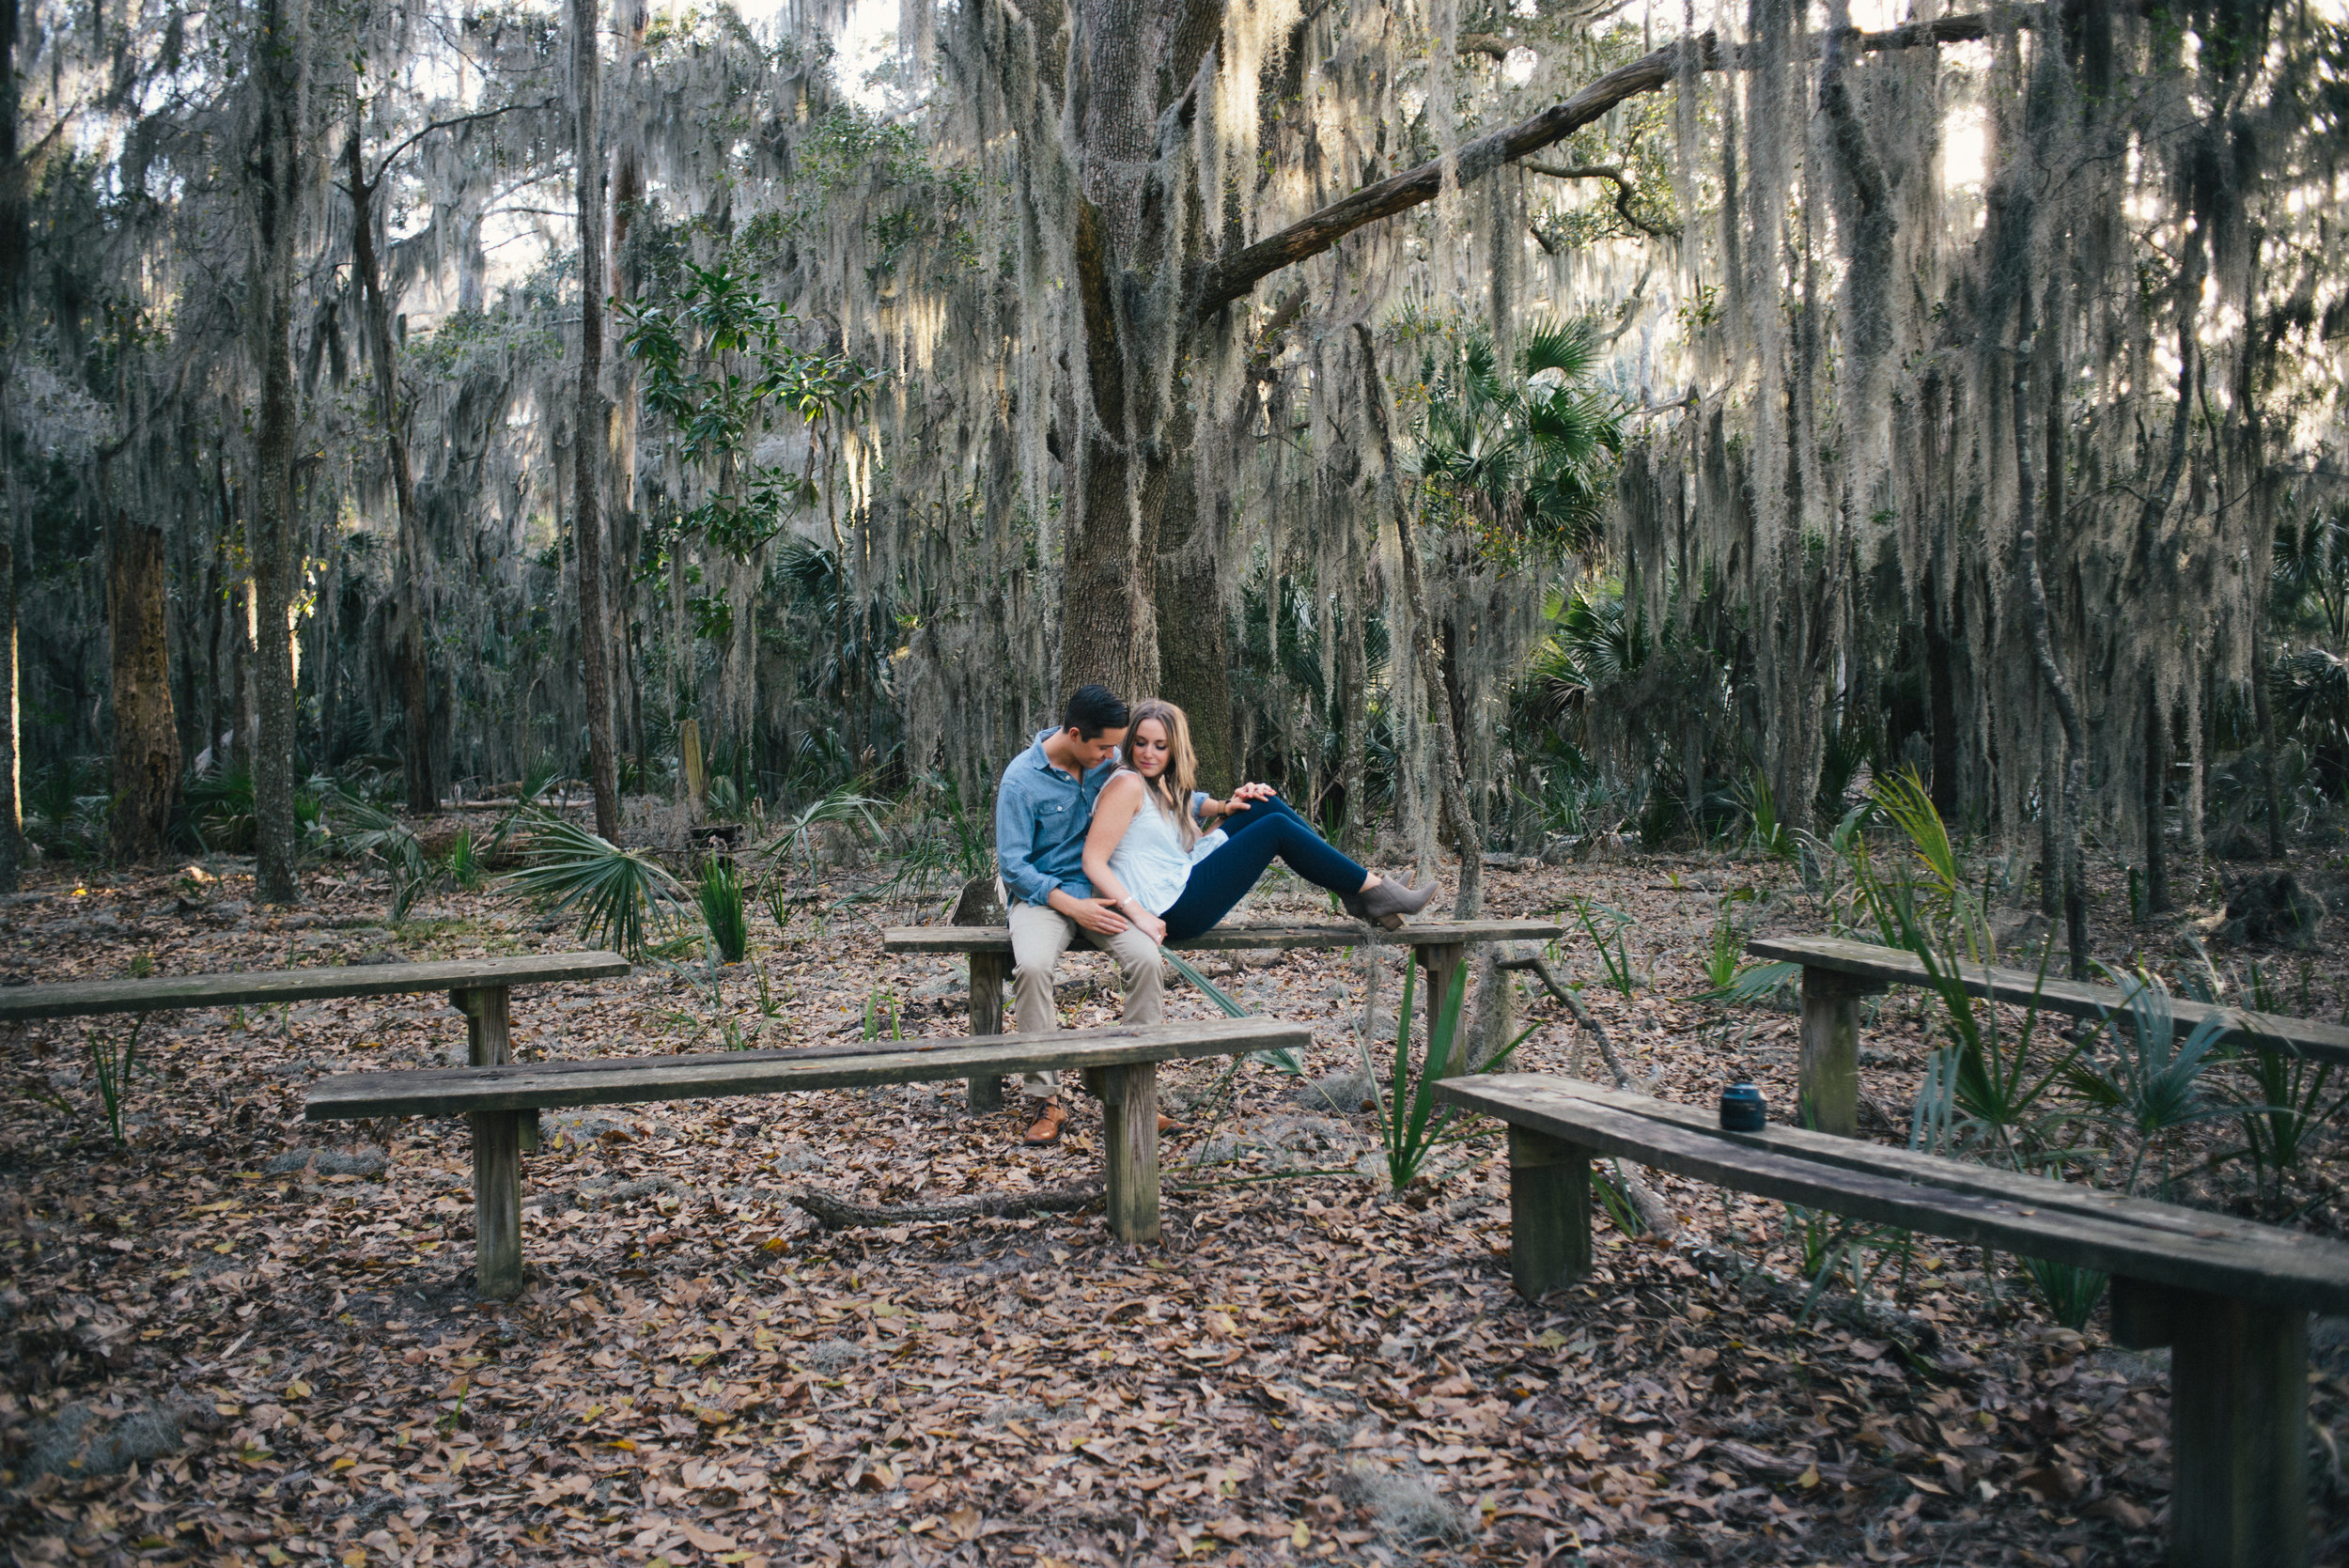 savannah-wedding-photographer-skidaway-island-engagement-hillary-and-ryan-march-2016- (26 of 147).jpg